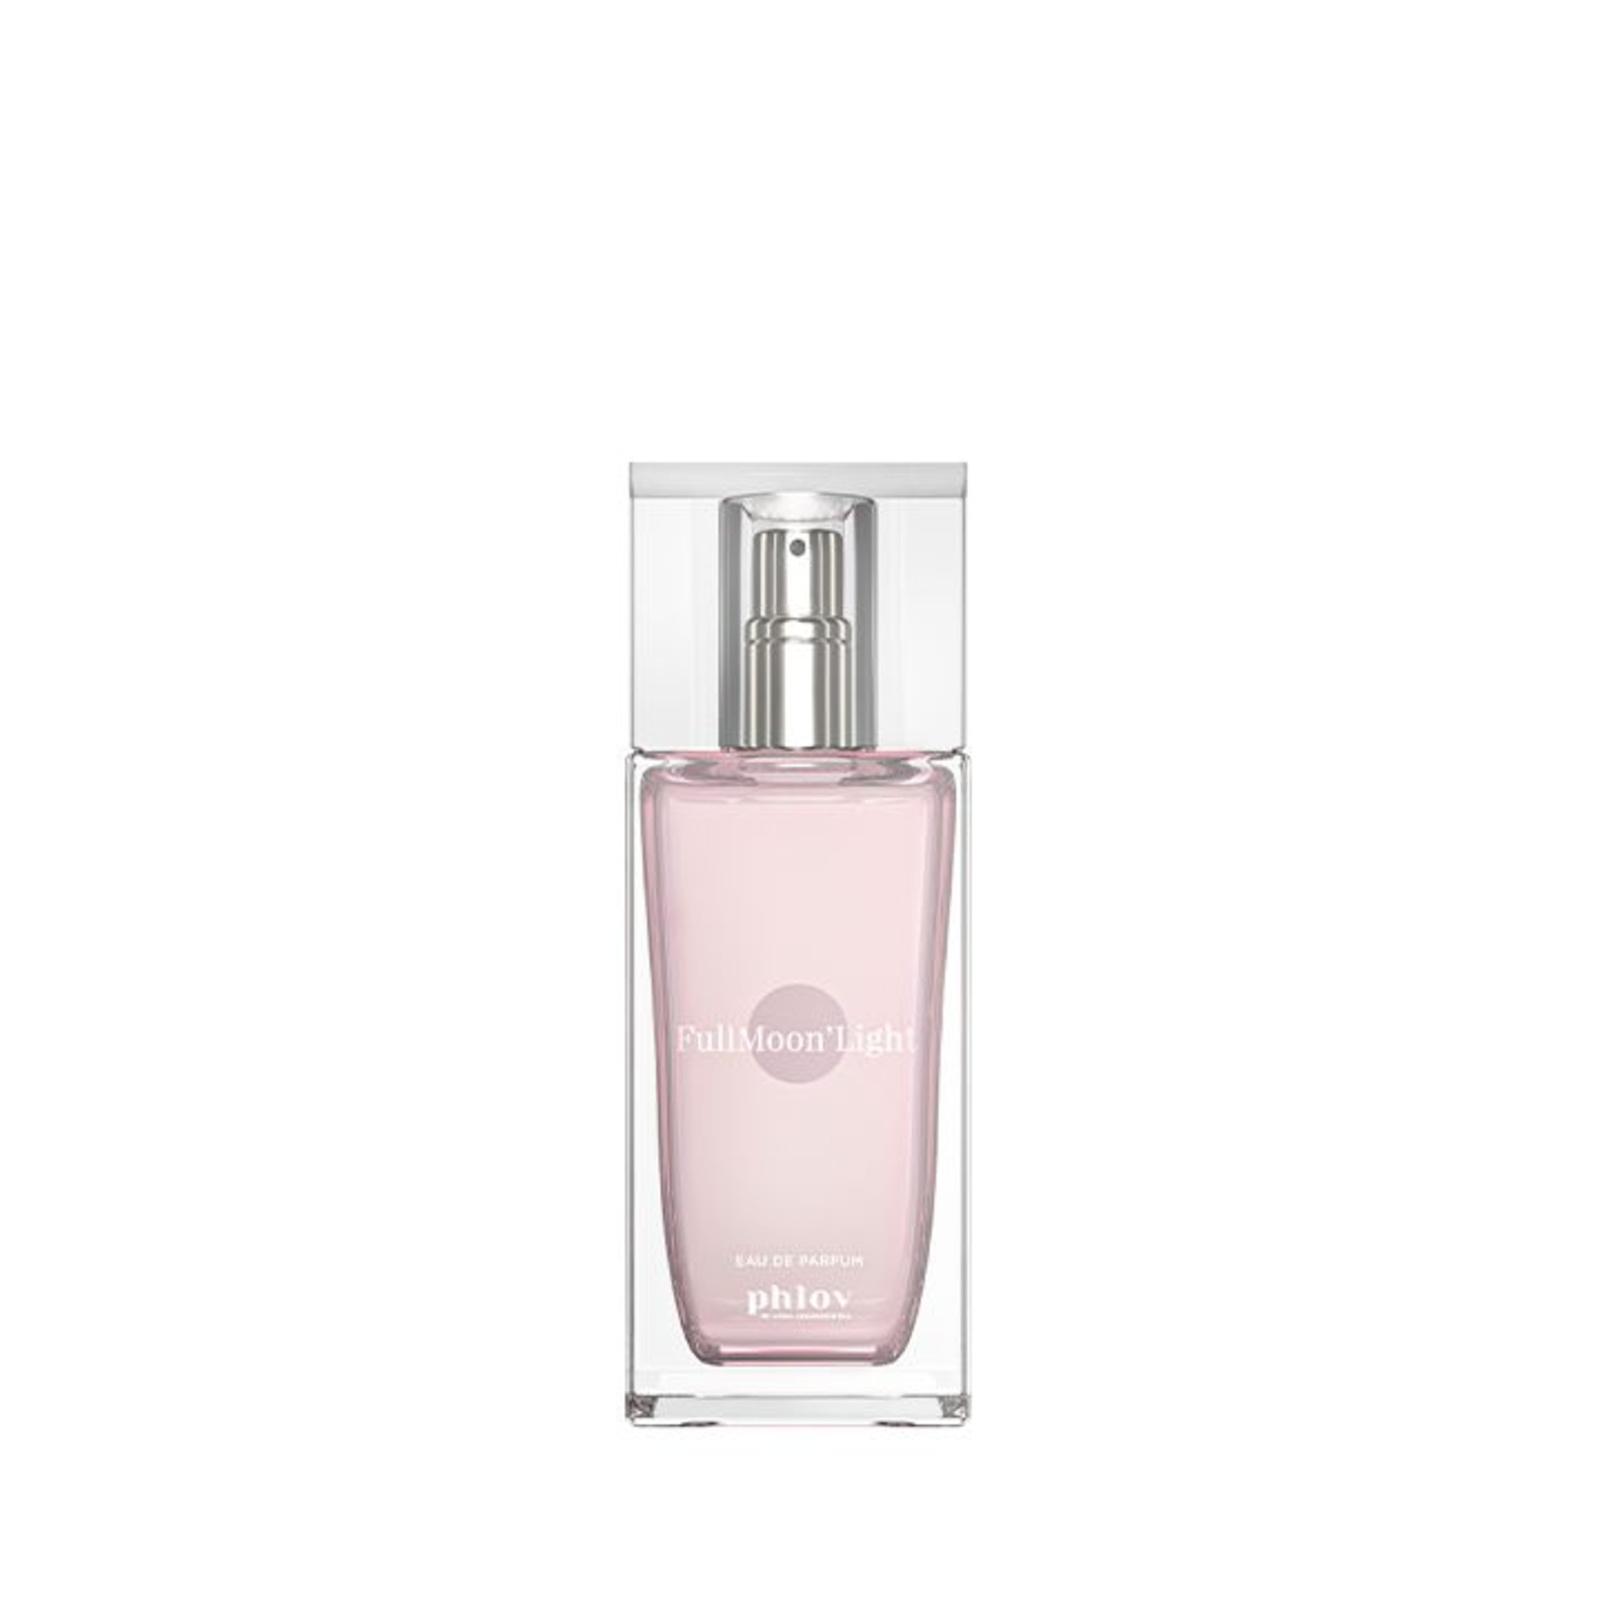 Perfumy wegańskie FullMoon'Light 50ml